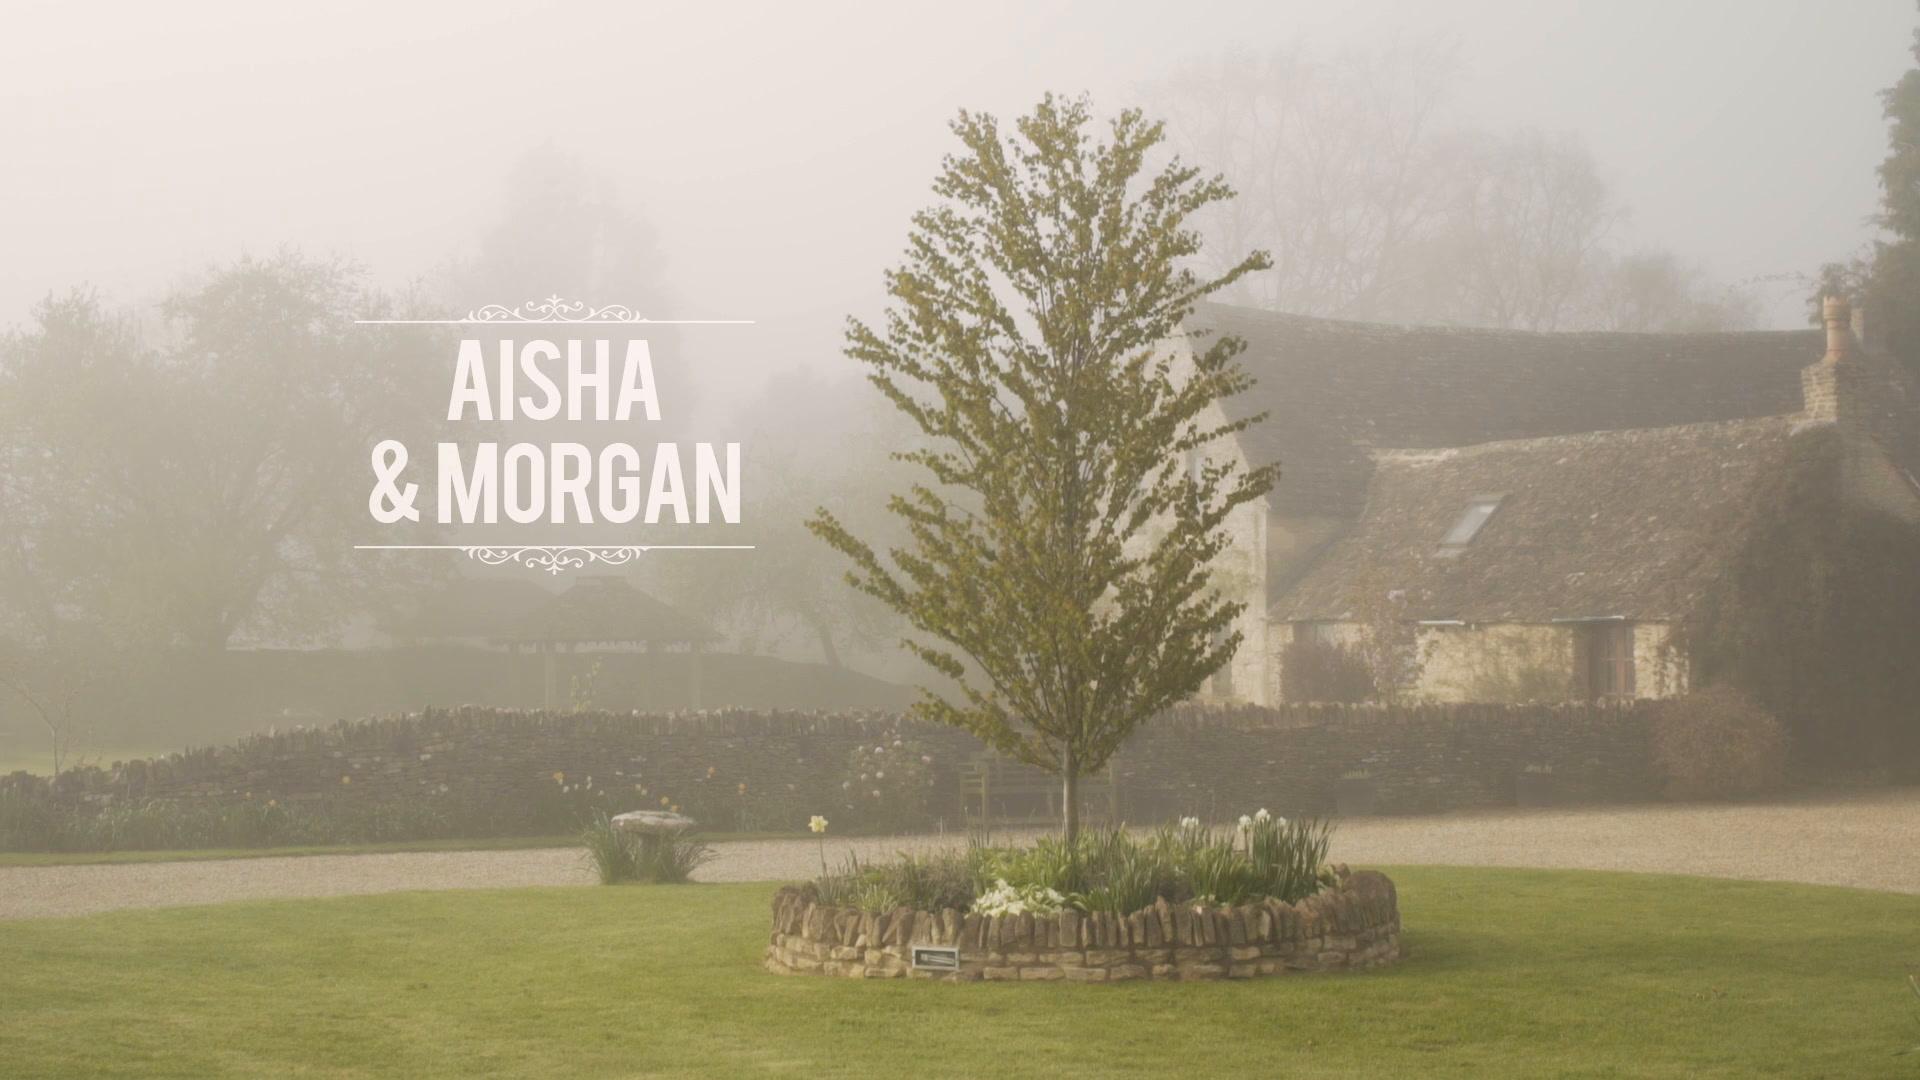 Aisha + Morgan | Tetbury, United Kingdom | The great Tythe Barn